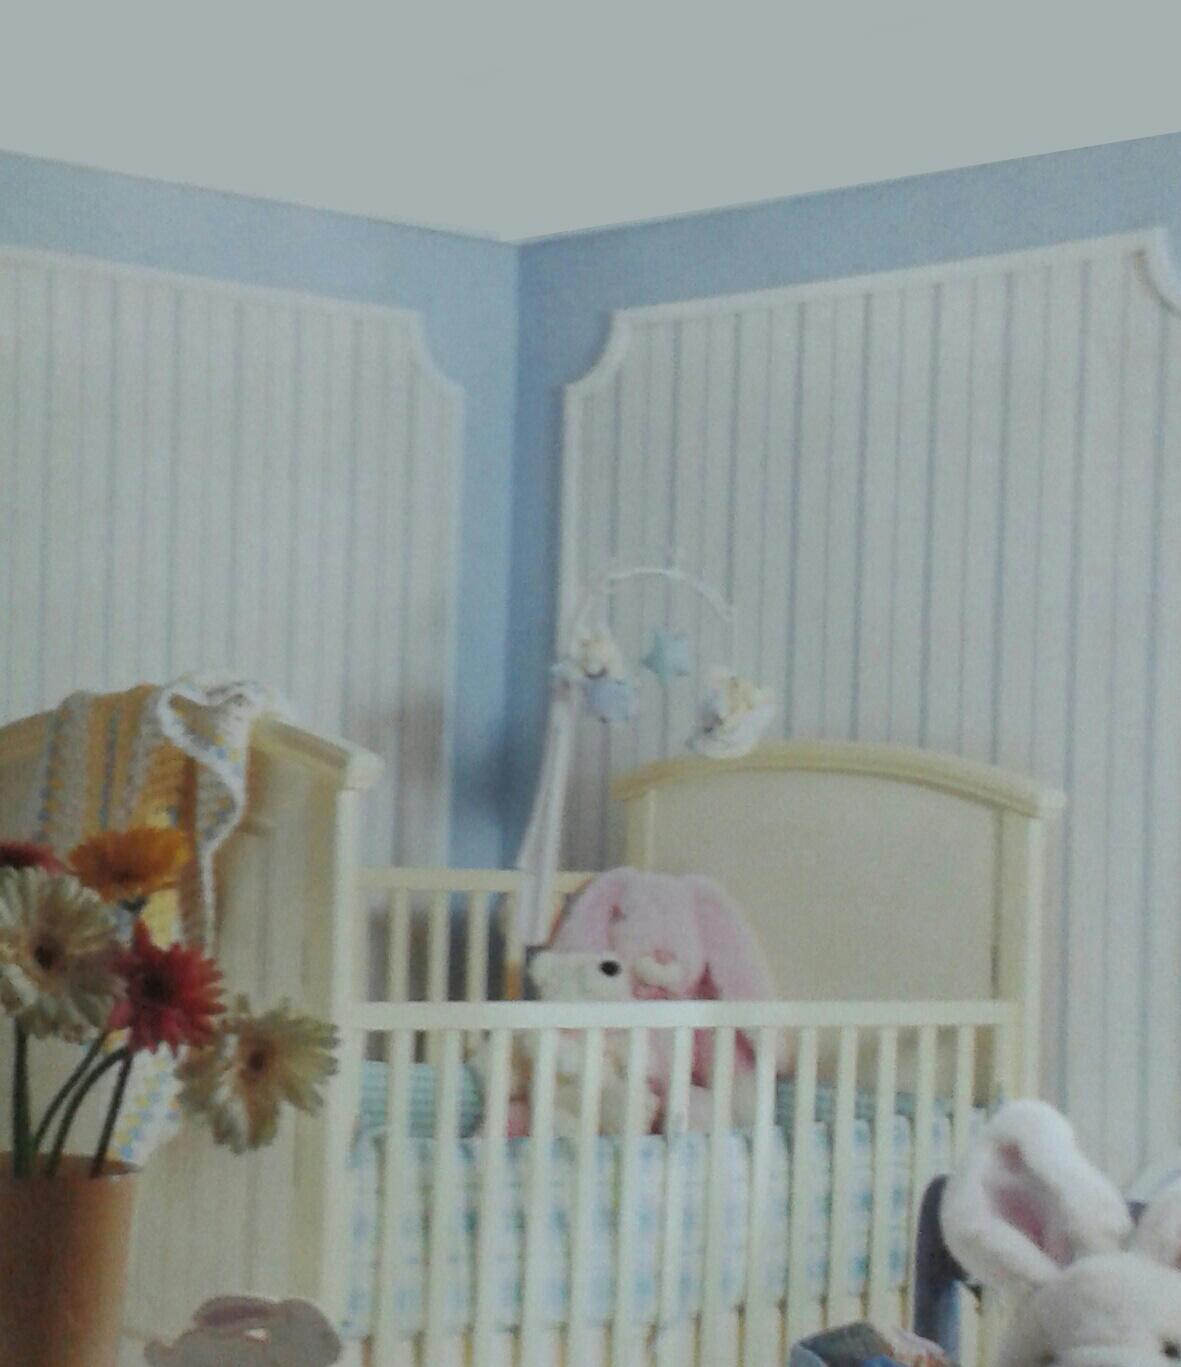 Primera habitaci n parte ii el papel pintado the for Papel de empapelar paredes